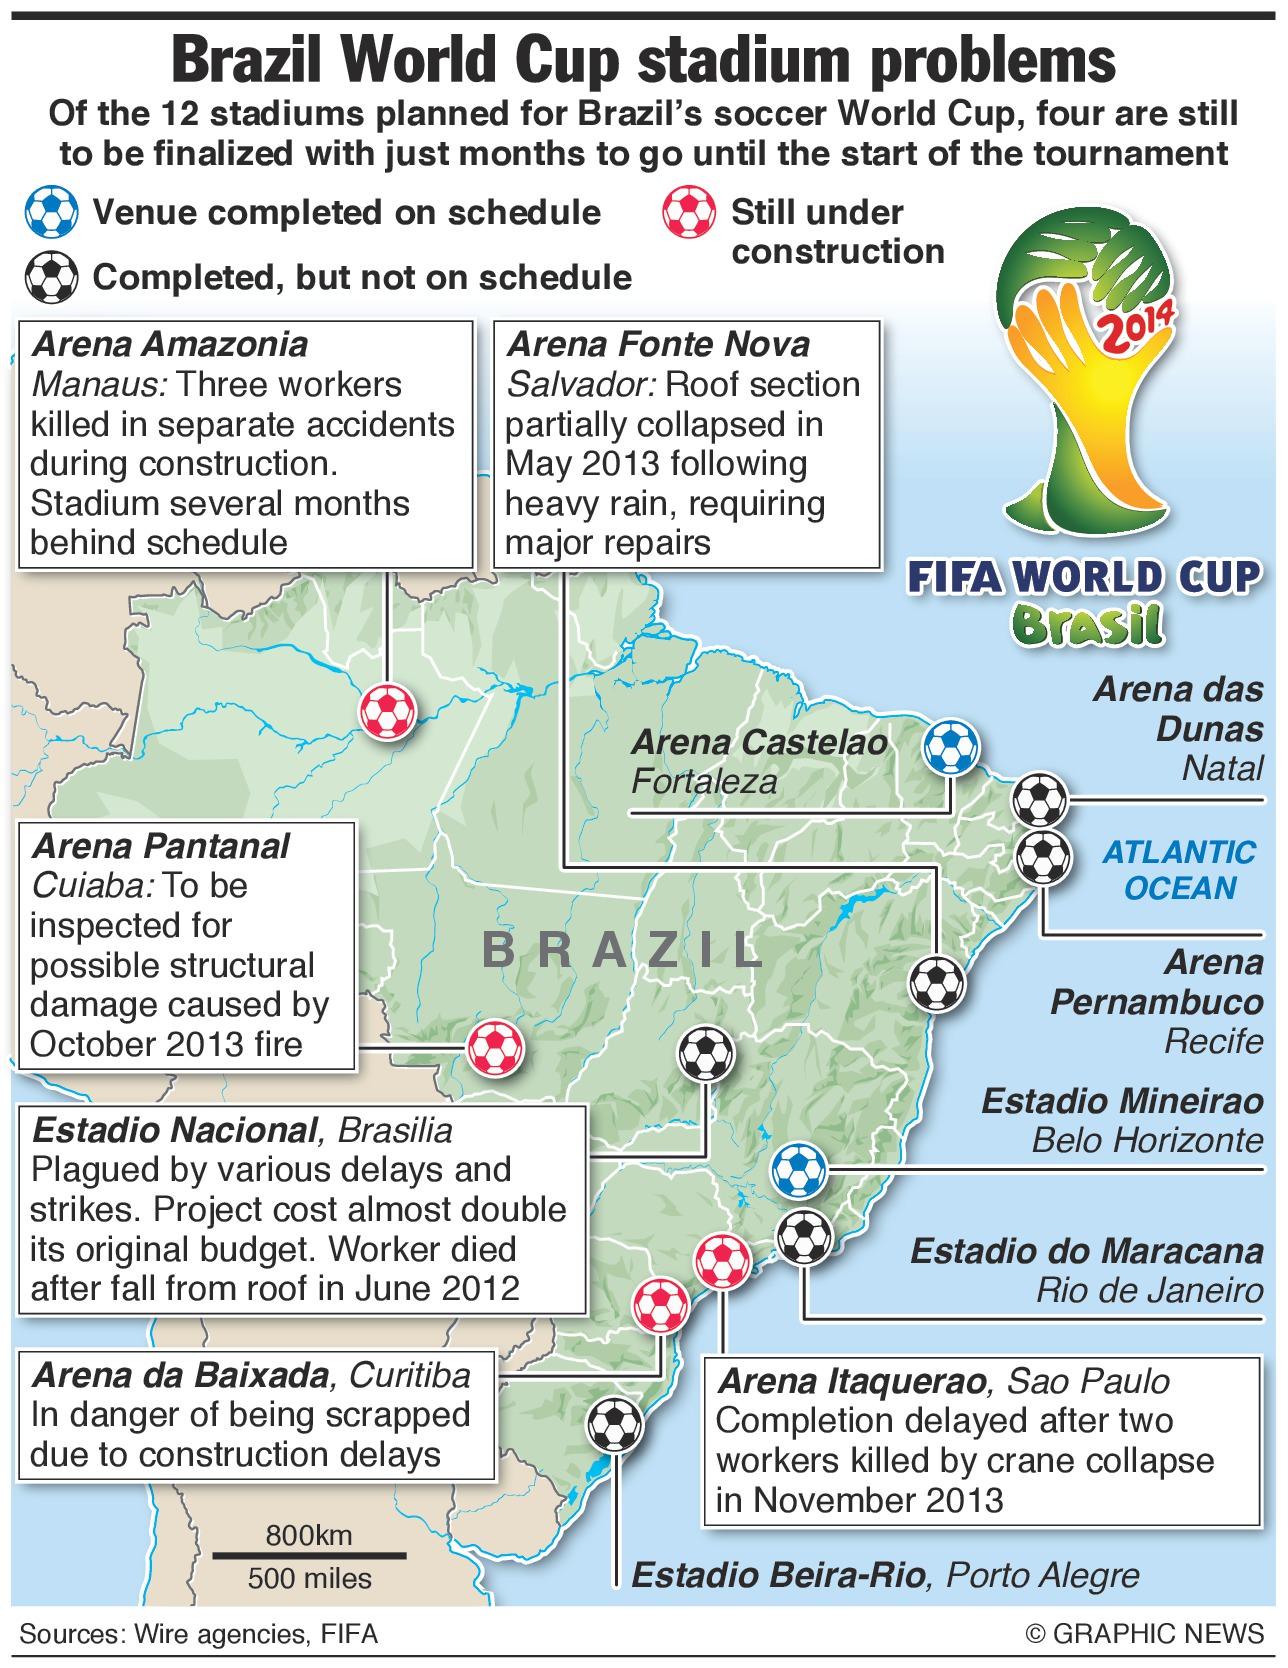 Brazil soccer world cup 2014 stadiums